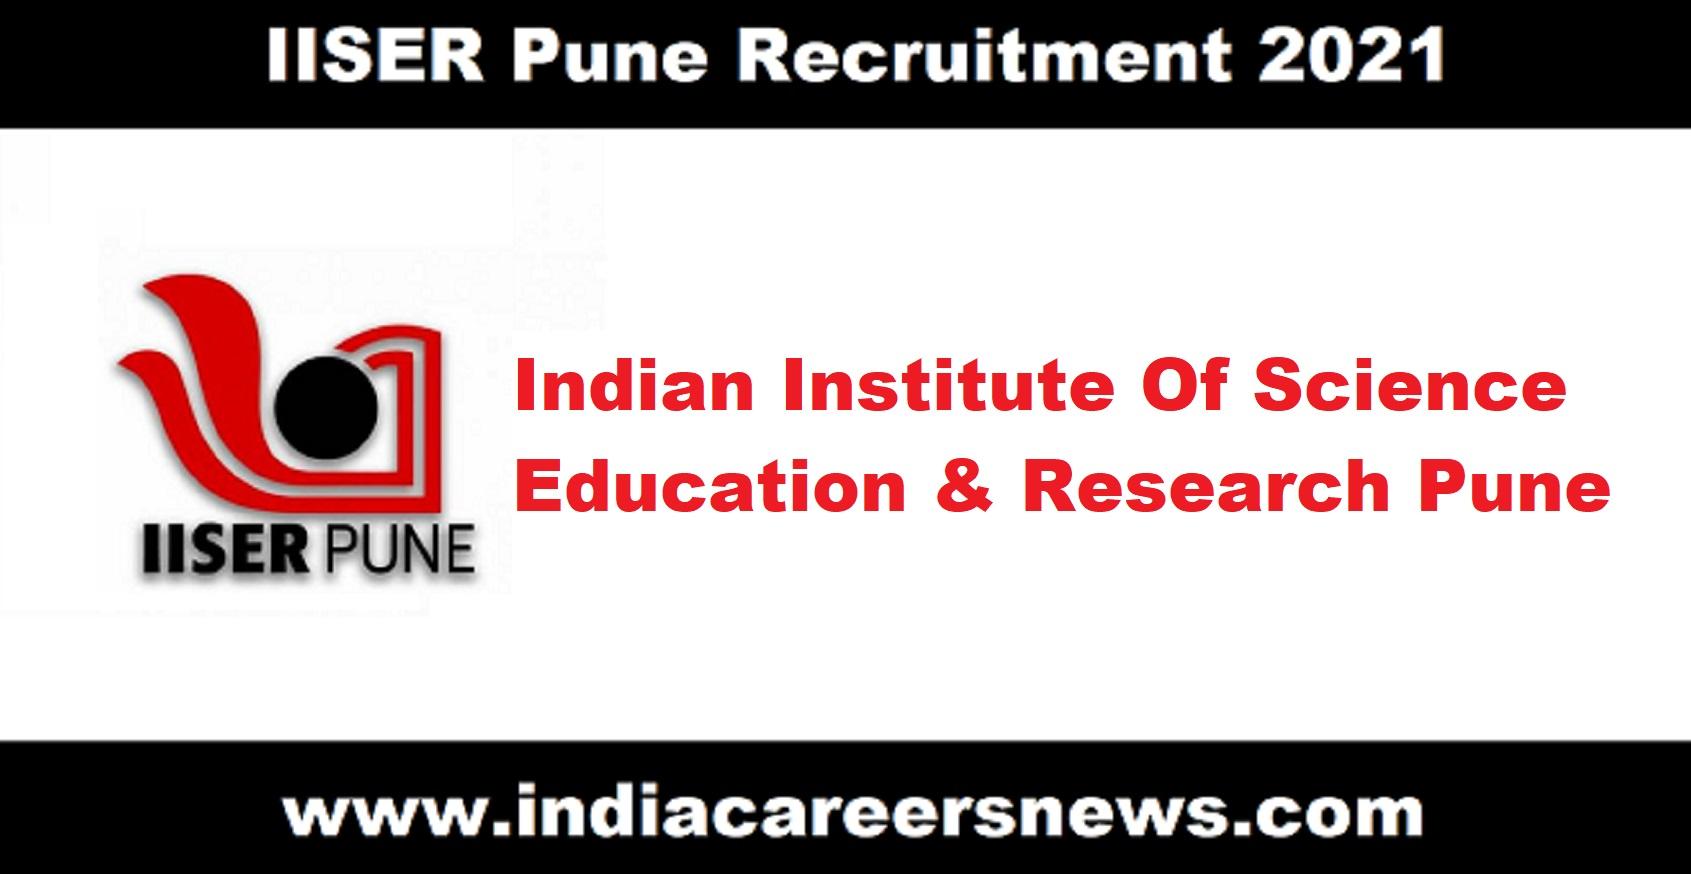 IISER Pune Recruitment